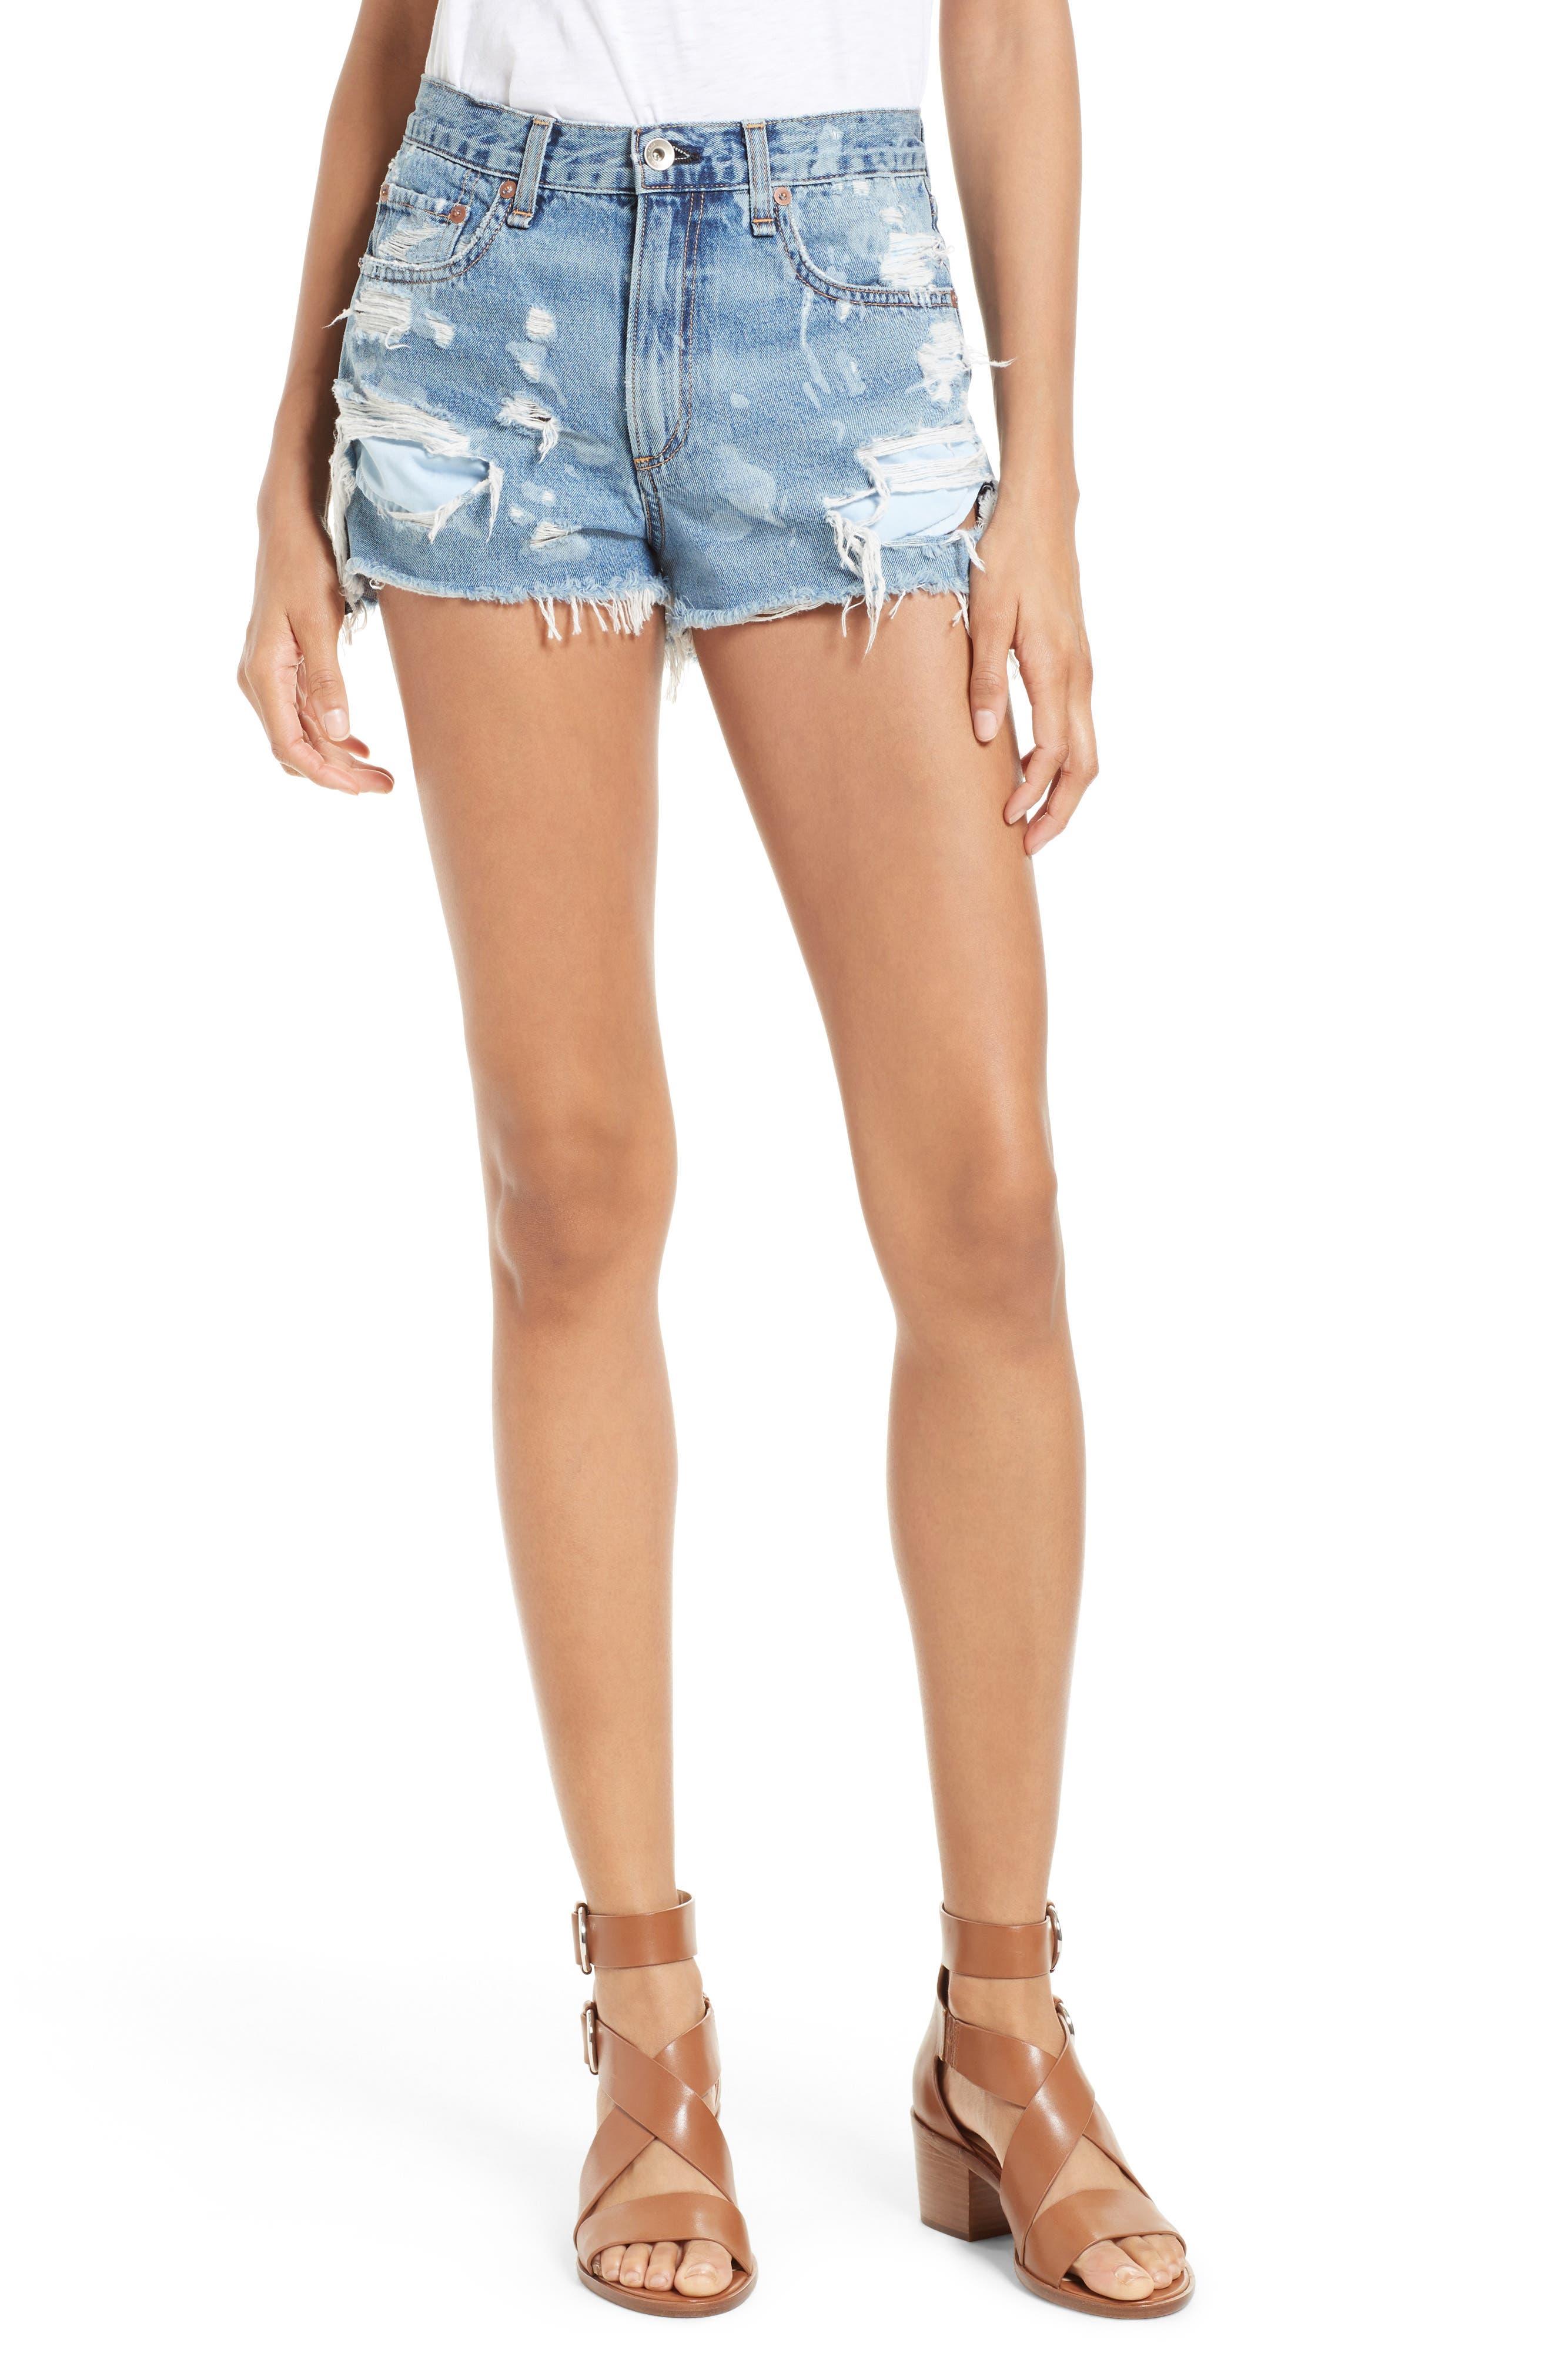 Cheap Sale Store Rag & Bone/jean Woman Marilyn Distressed Boyfriend Jeans Light Denim Size 27 Rag & Bone Discount Very Cheap Sale Comfortable Cheap 2018 New EP6ukV